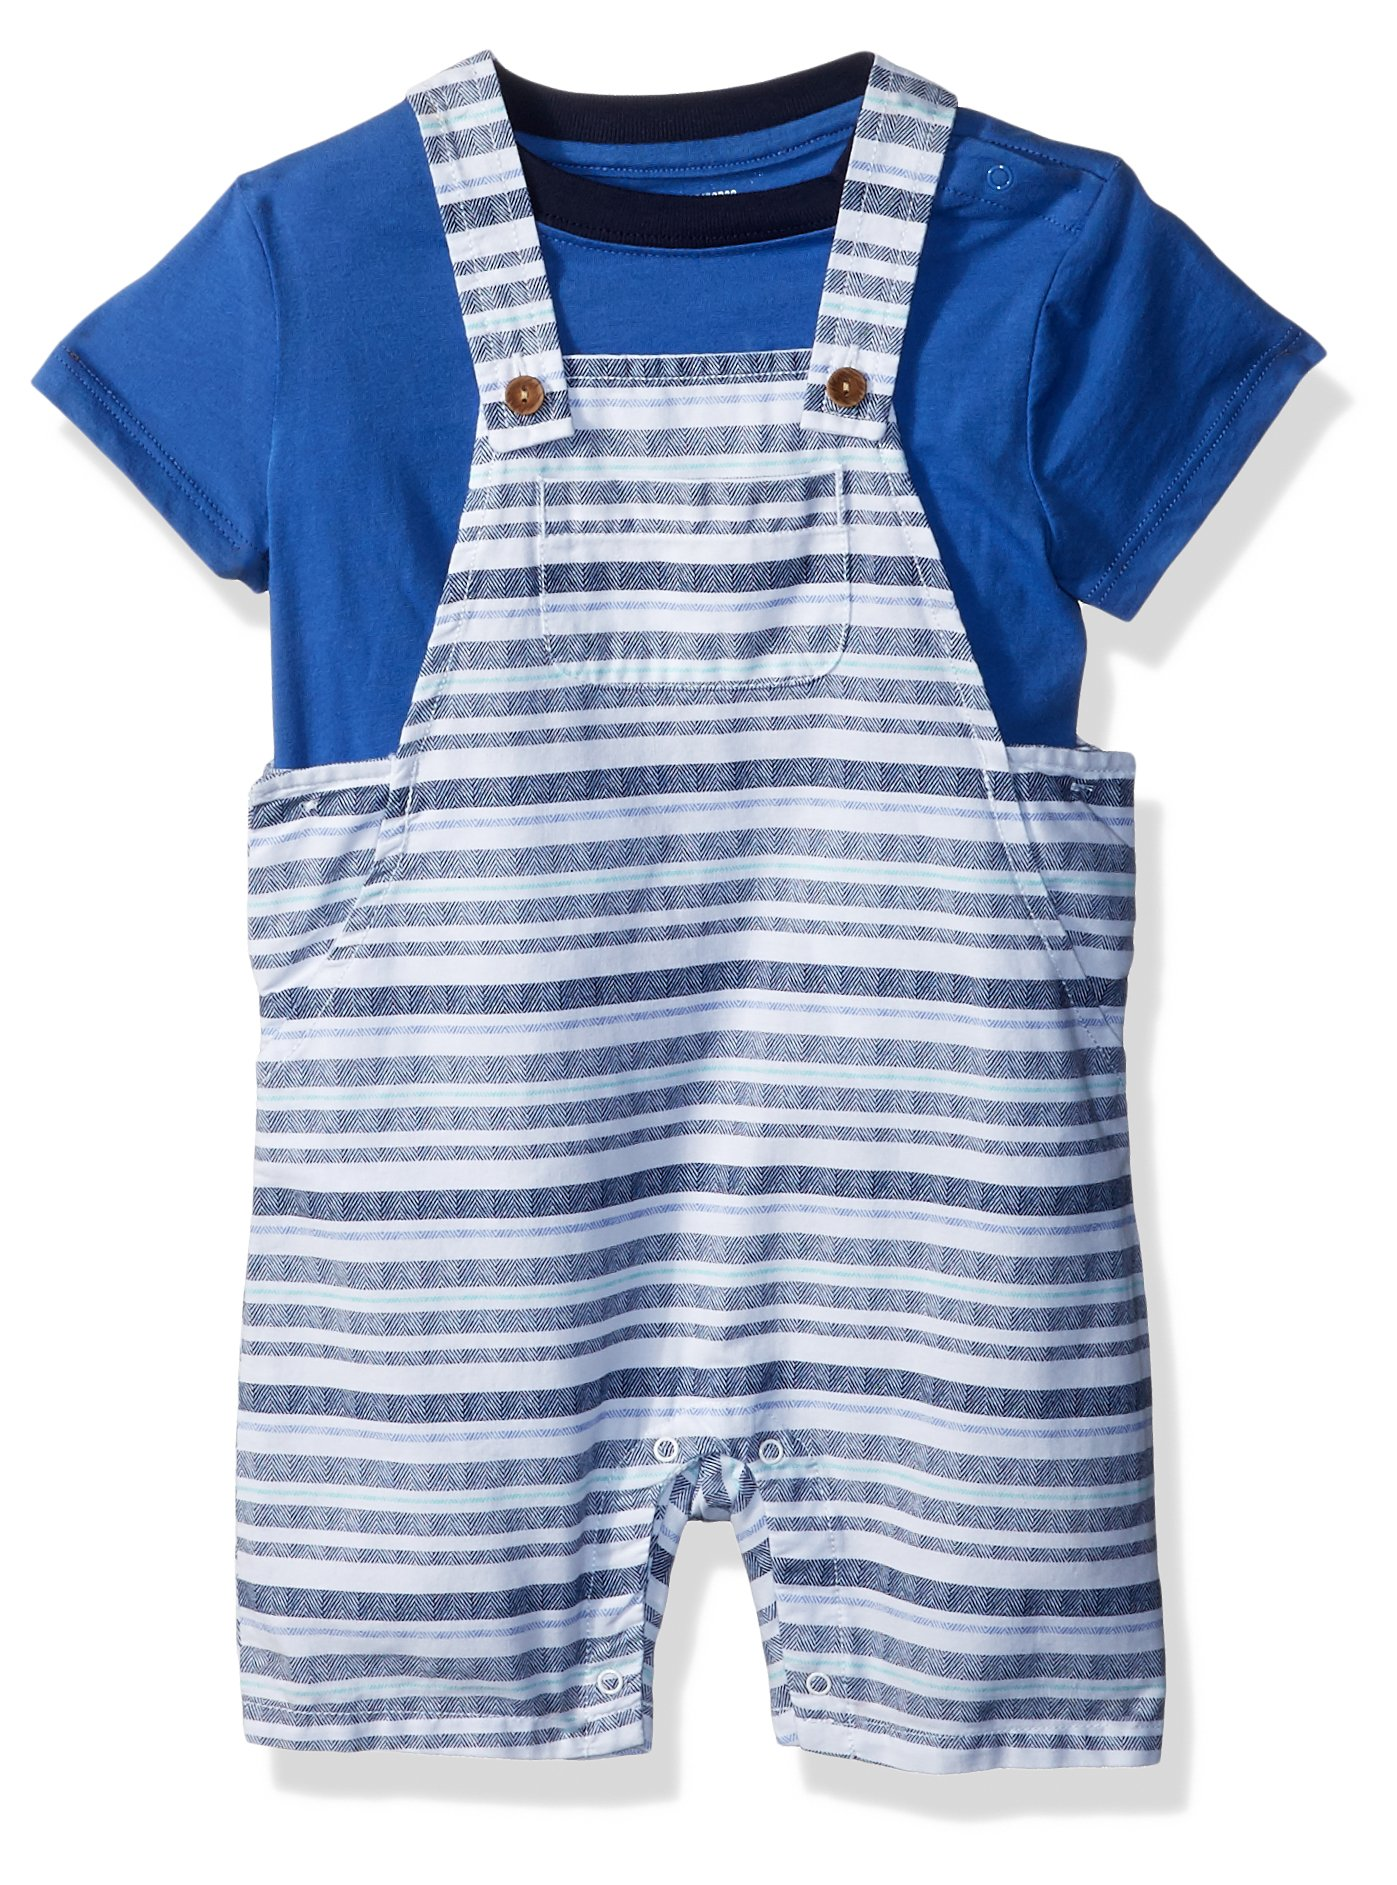 Gymboree Boys' Toddler' Short Sleeve Striped Overall Set, Gym Navy, 12-18 mo